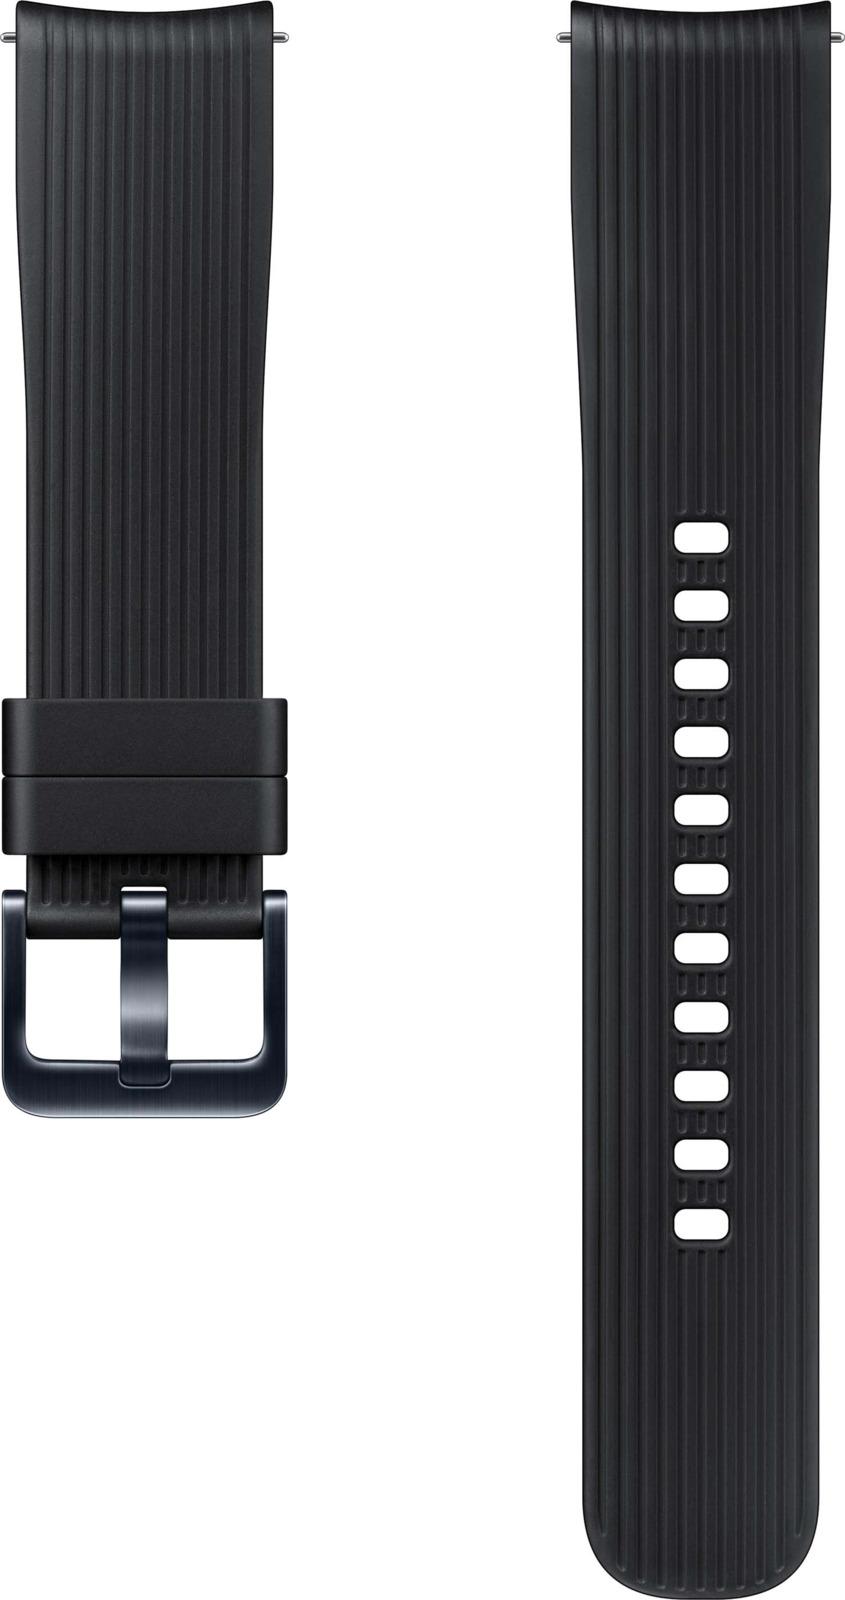 Ремешок для смарт-часов Samsung для Galaxy Watch 42мм/Gear Sport, черный ремешок samsung для samsung galaxy watch 46мм samsung gear sport серый